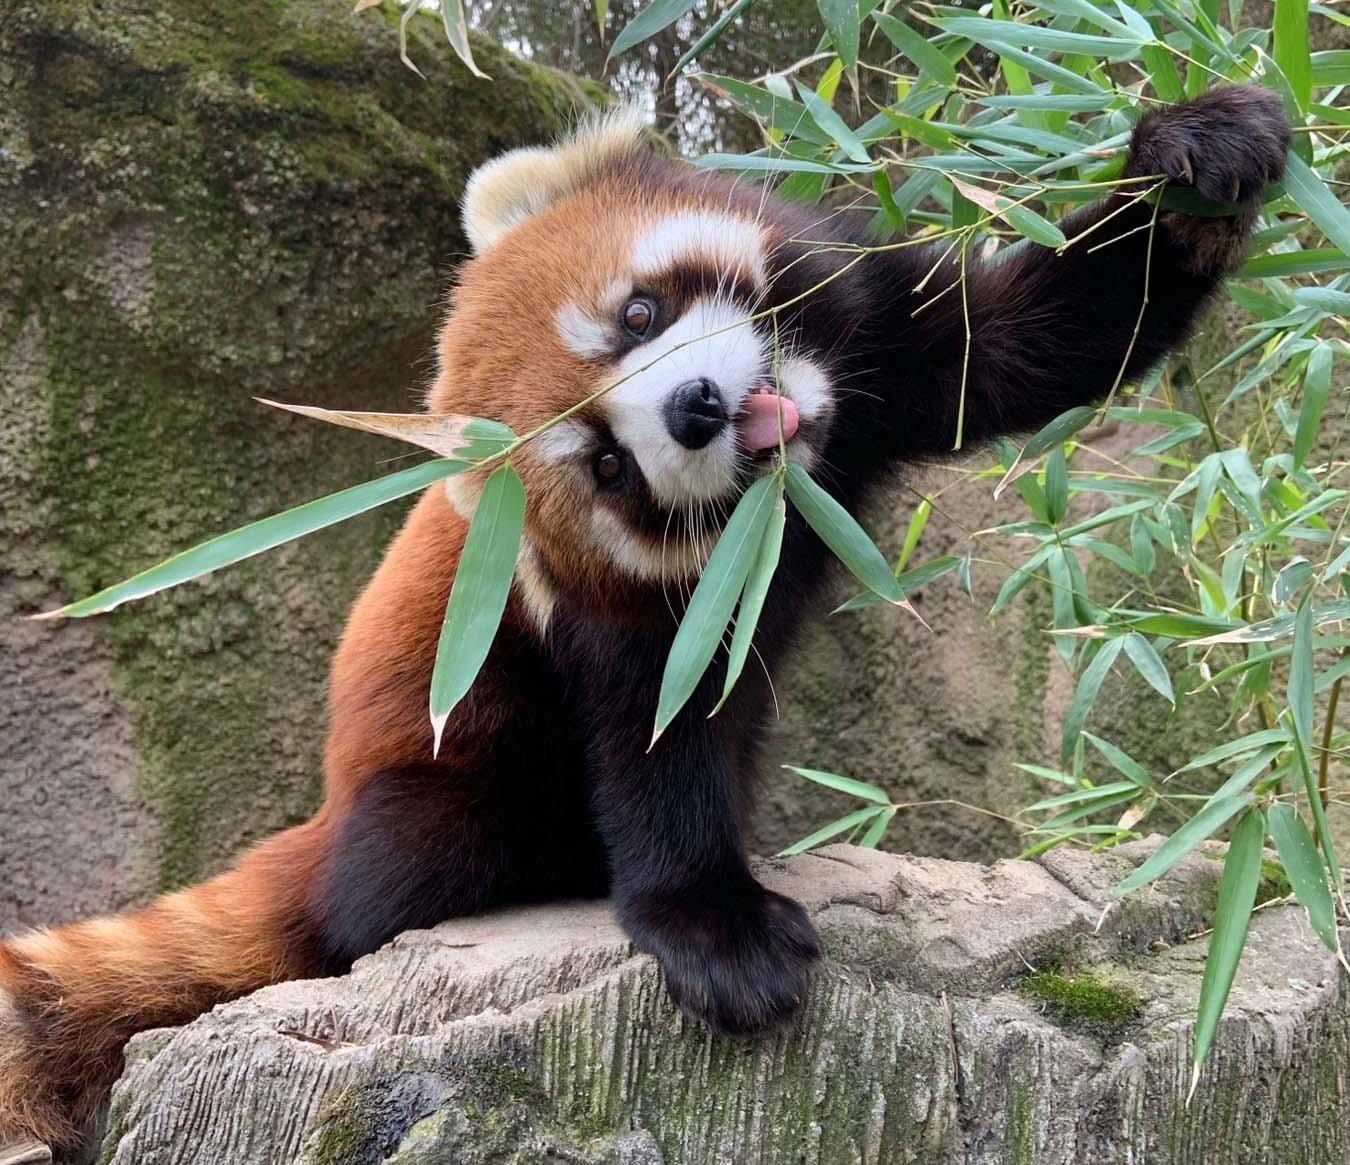 Things to Do in Columbus - Columbus Zoo and Aquarium